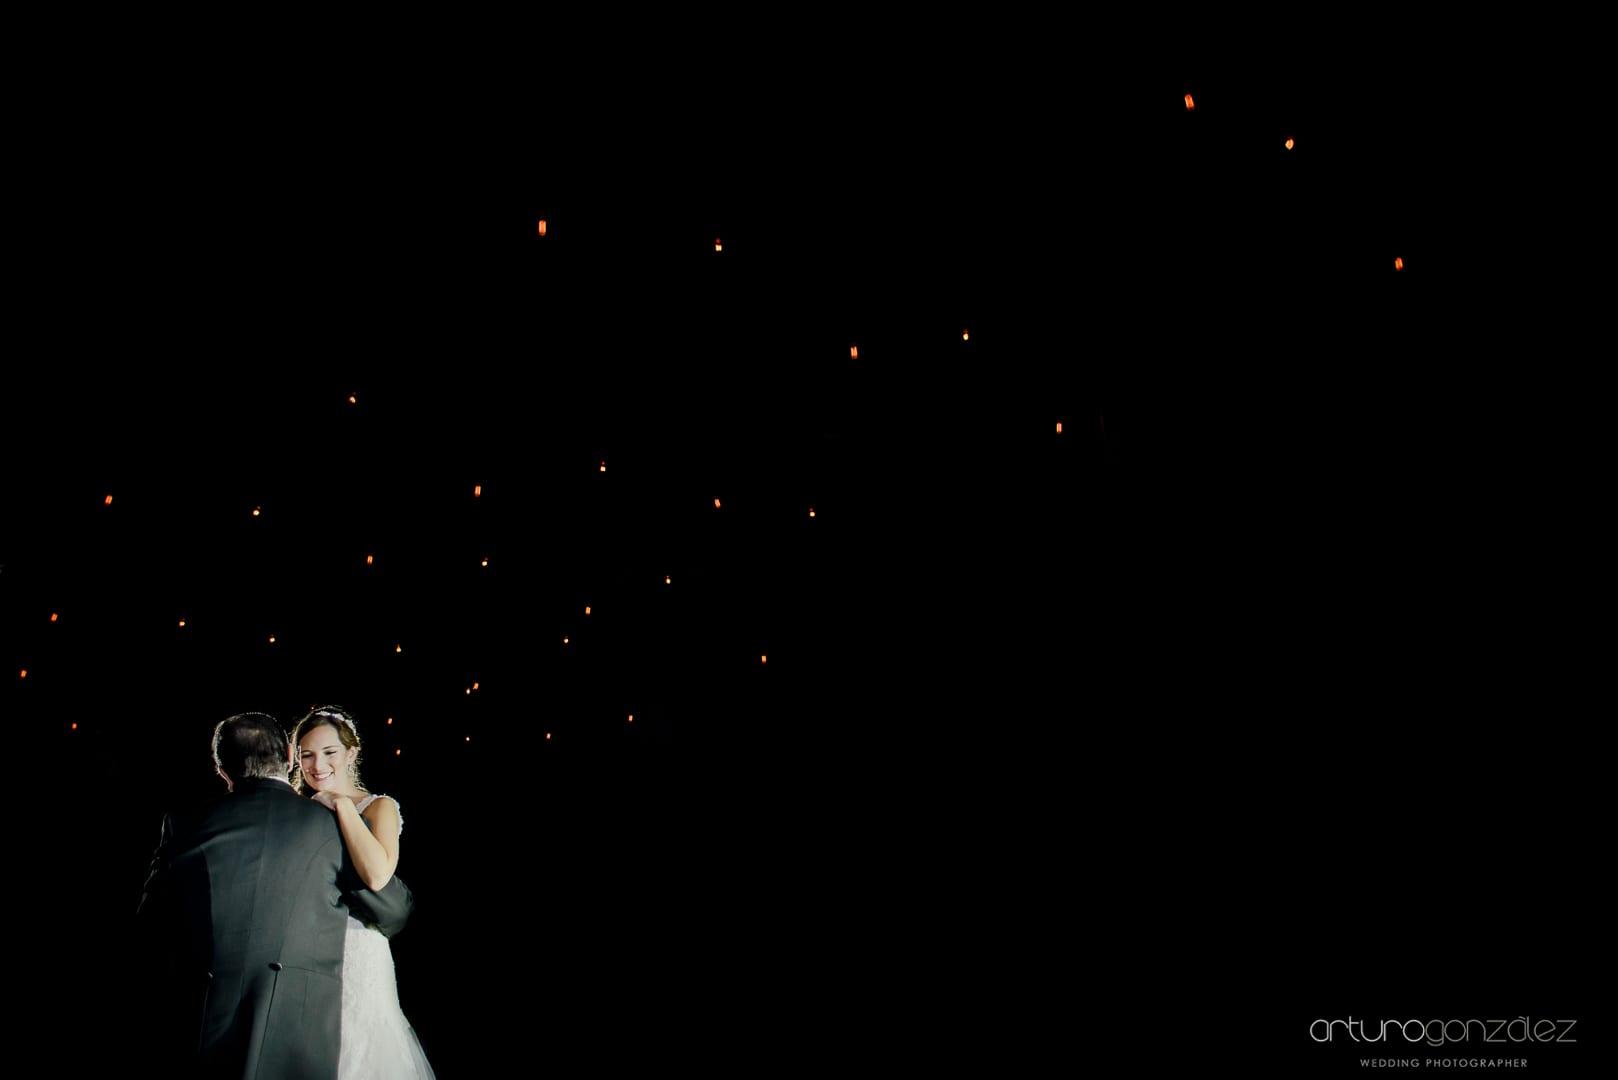 fotografo-de-bodas-en-guanajuato-118